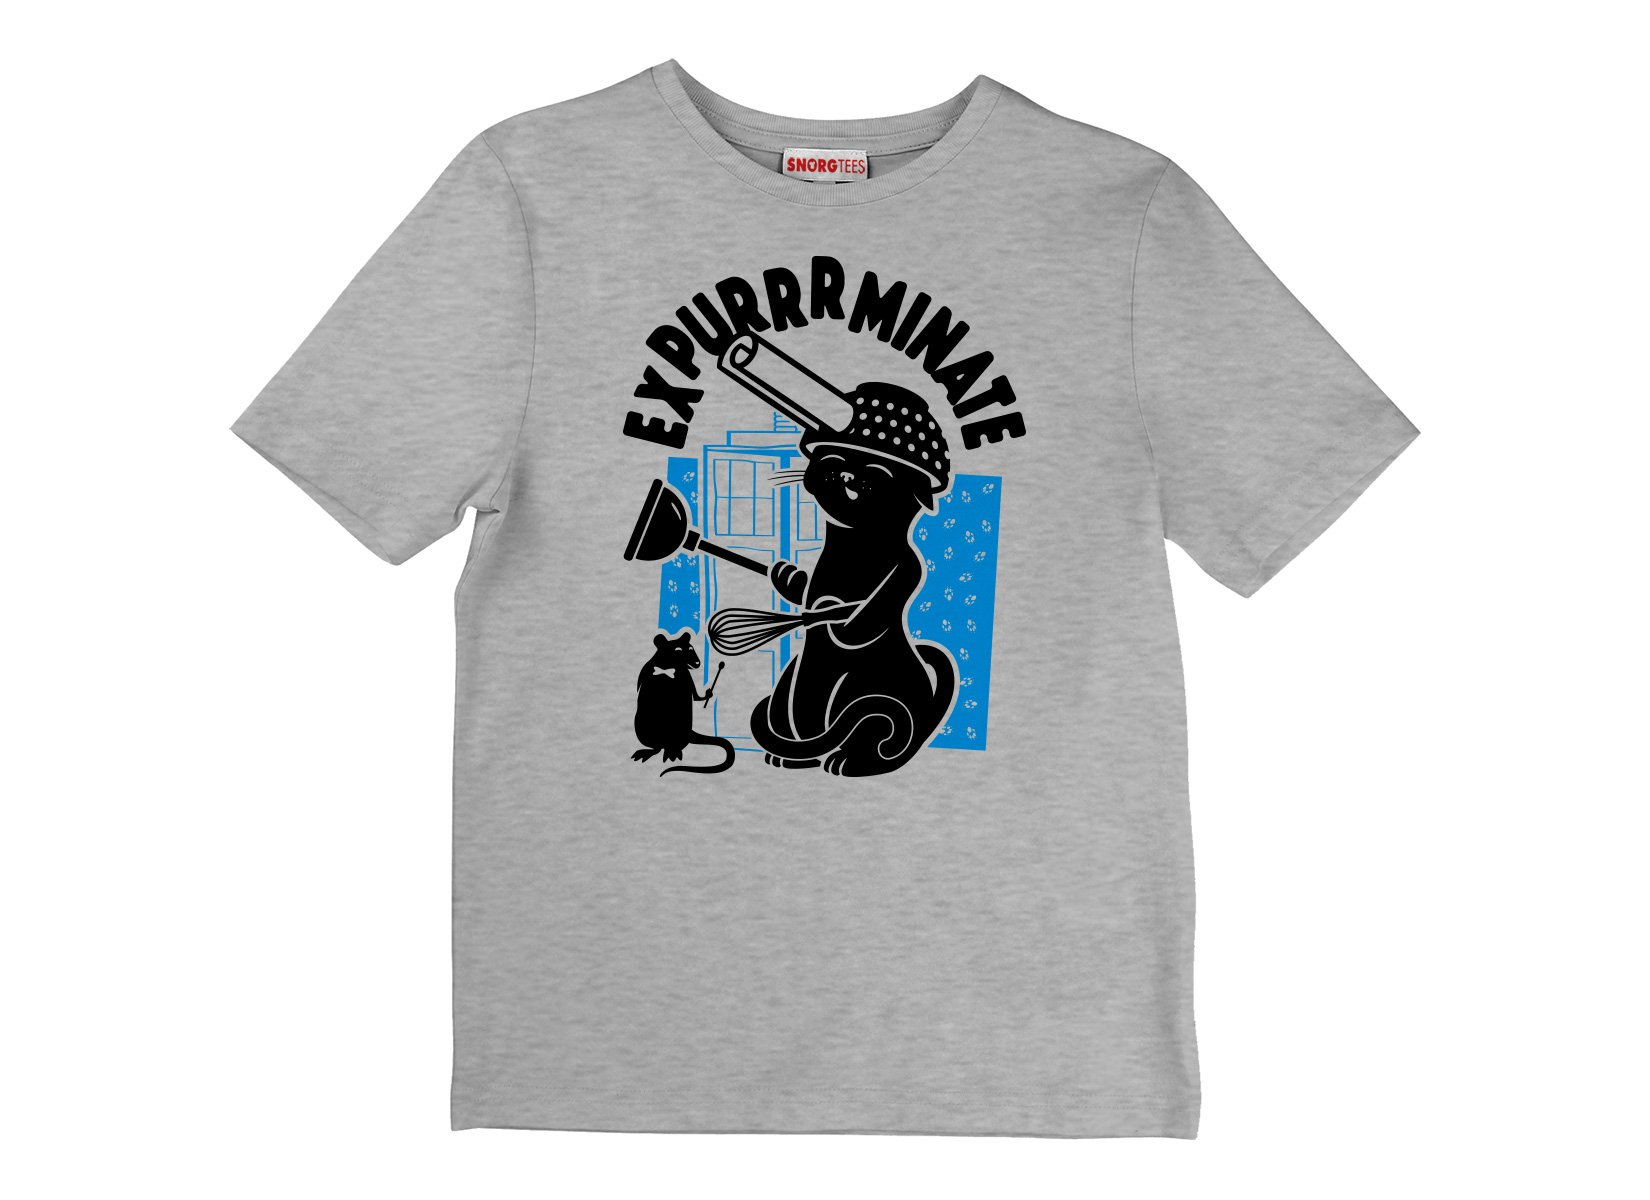 Expurrrminate on Kids T-Shirt